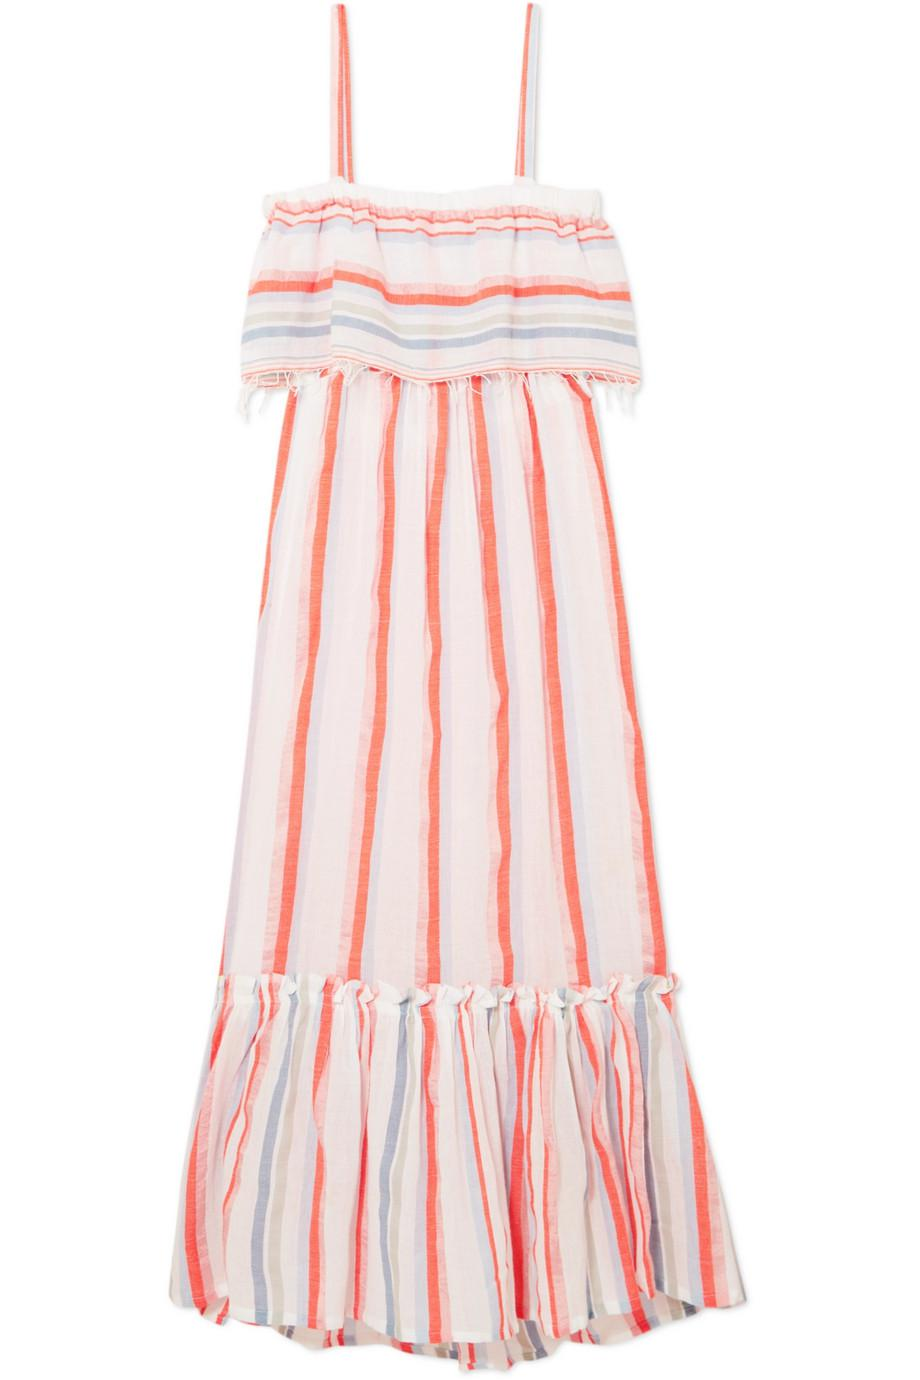 Asha Tiered Striped Cotton-blend Gauze Maxi Dress - Papaya Lemlem Low Price Sale Geniue Stockist Cheap Online Cheap New Visit Cheap Online q47fBsyVc